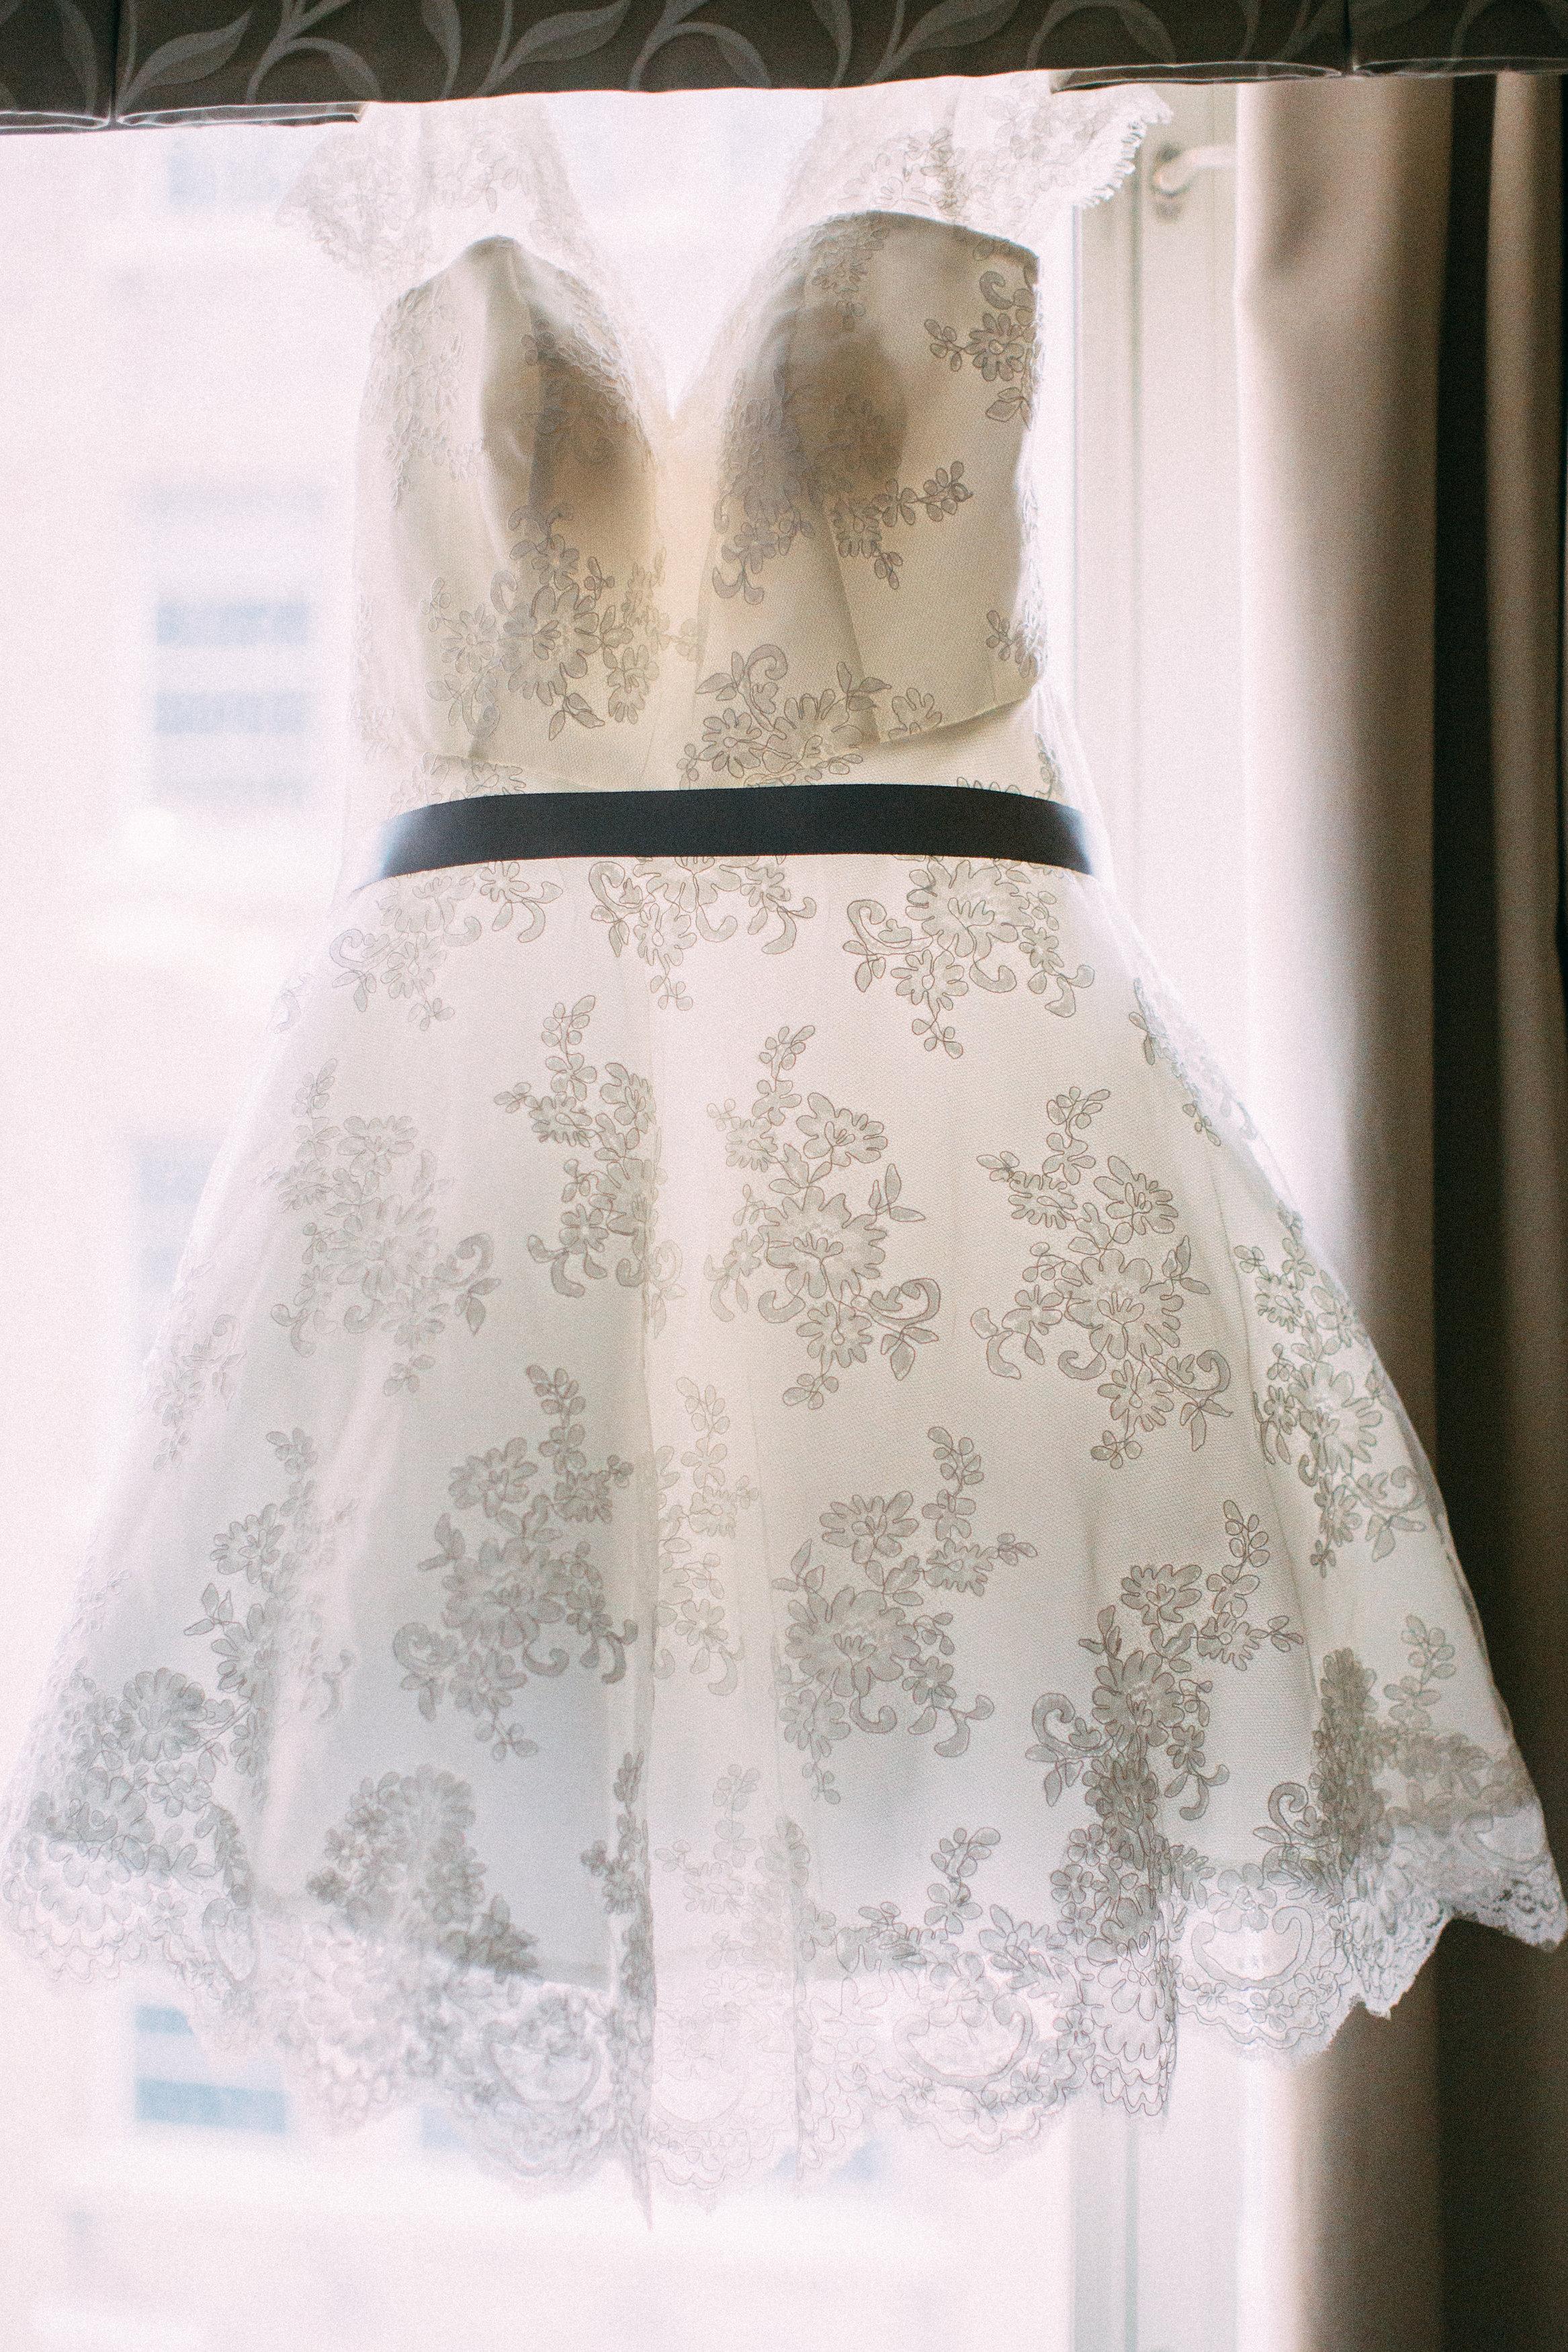 Bjorn & Company | NYC Weddings | Westchester Weddings | NYC Wedding Planner | Event Planning NYC